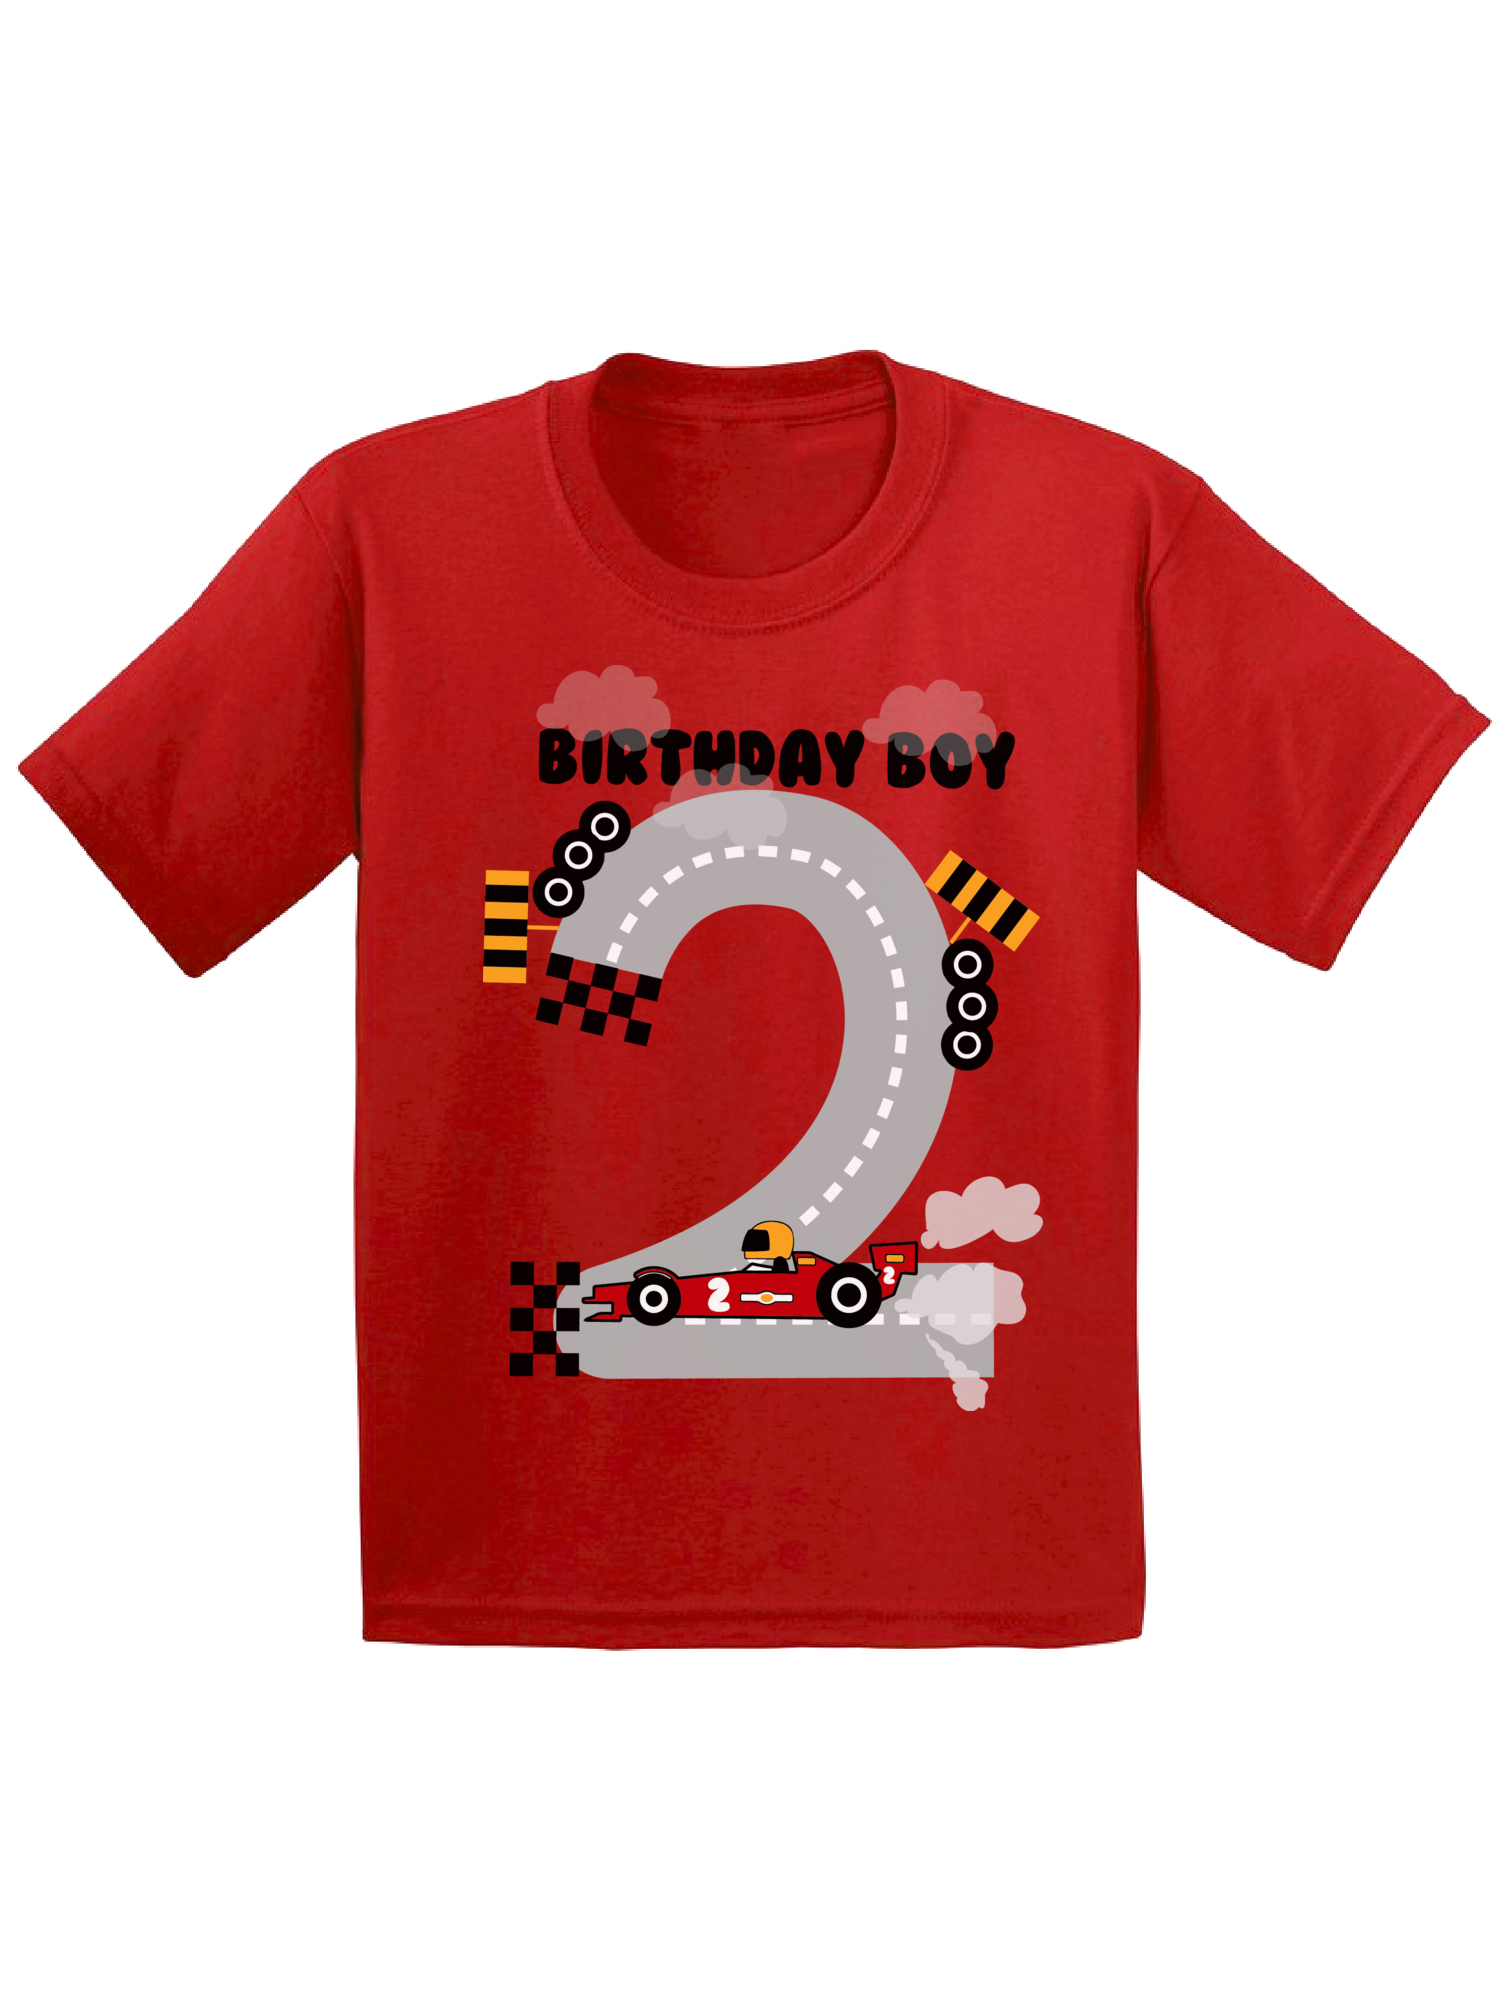 Funny Threadz Boys 1 Year Old Birthday Boy Toddler Shirt Birthday Candle Funny Threadz Kids White 2t Toddlers Walmart Com Walmart Com